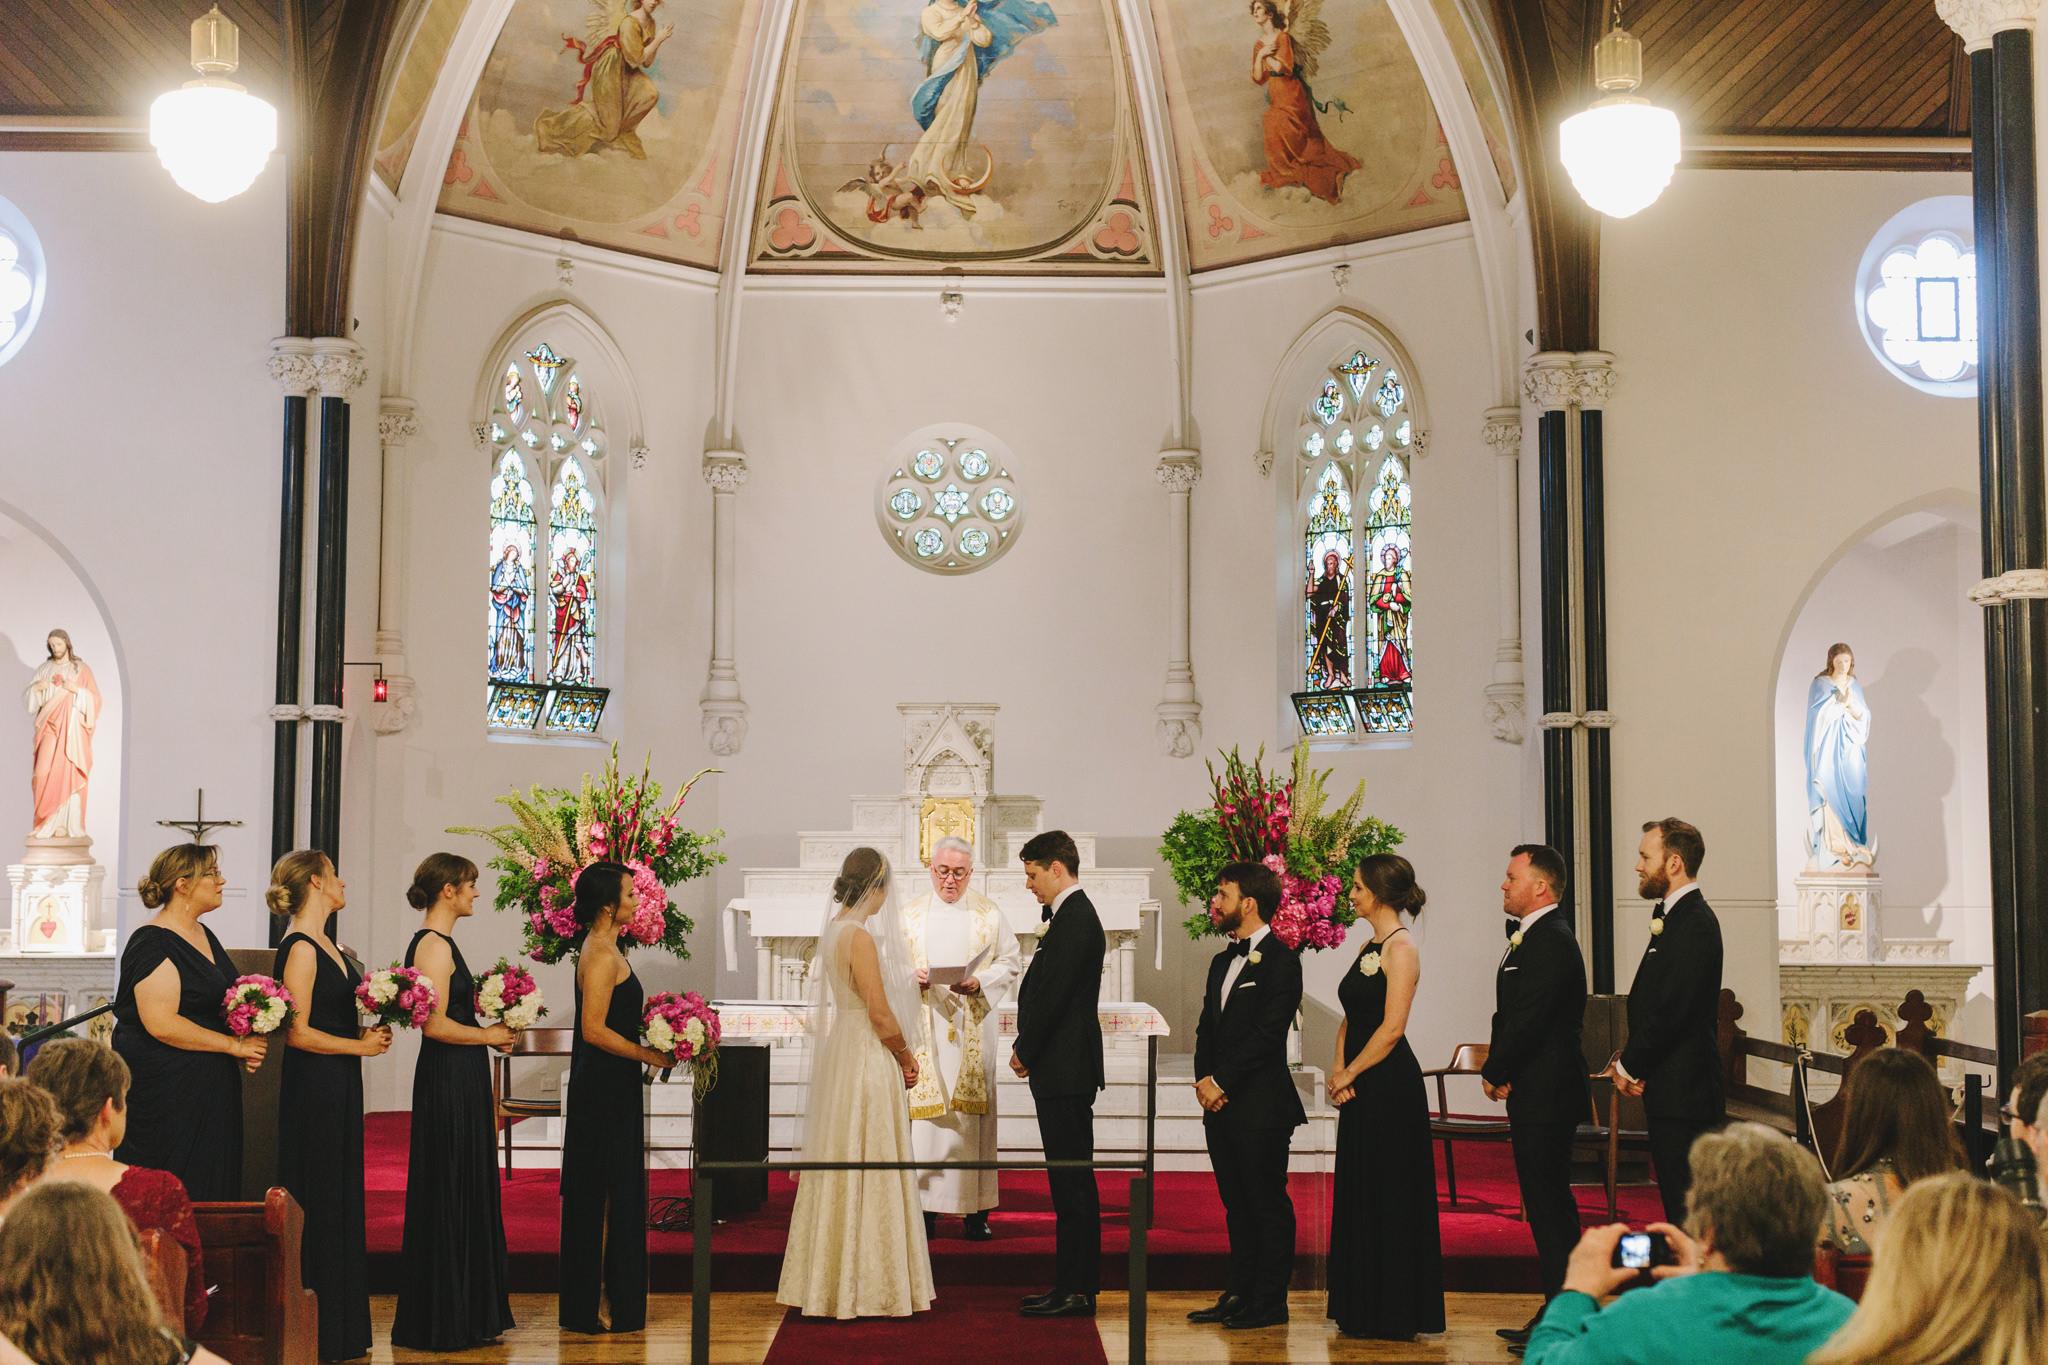 Abbotsford_Convent_Wedding_Peter_Anna055.JPG